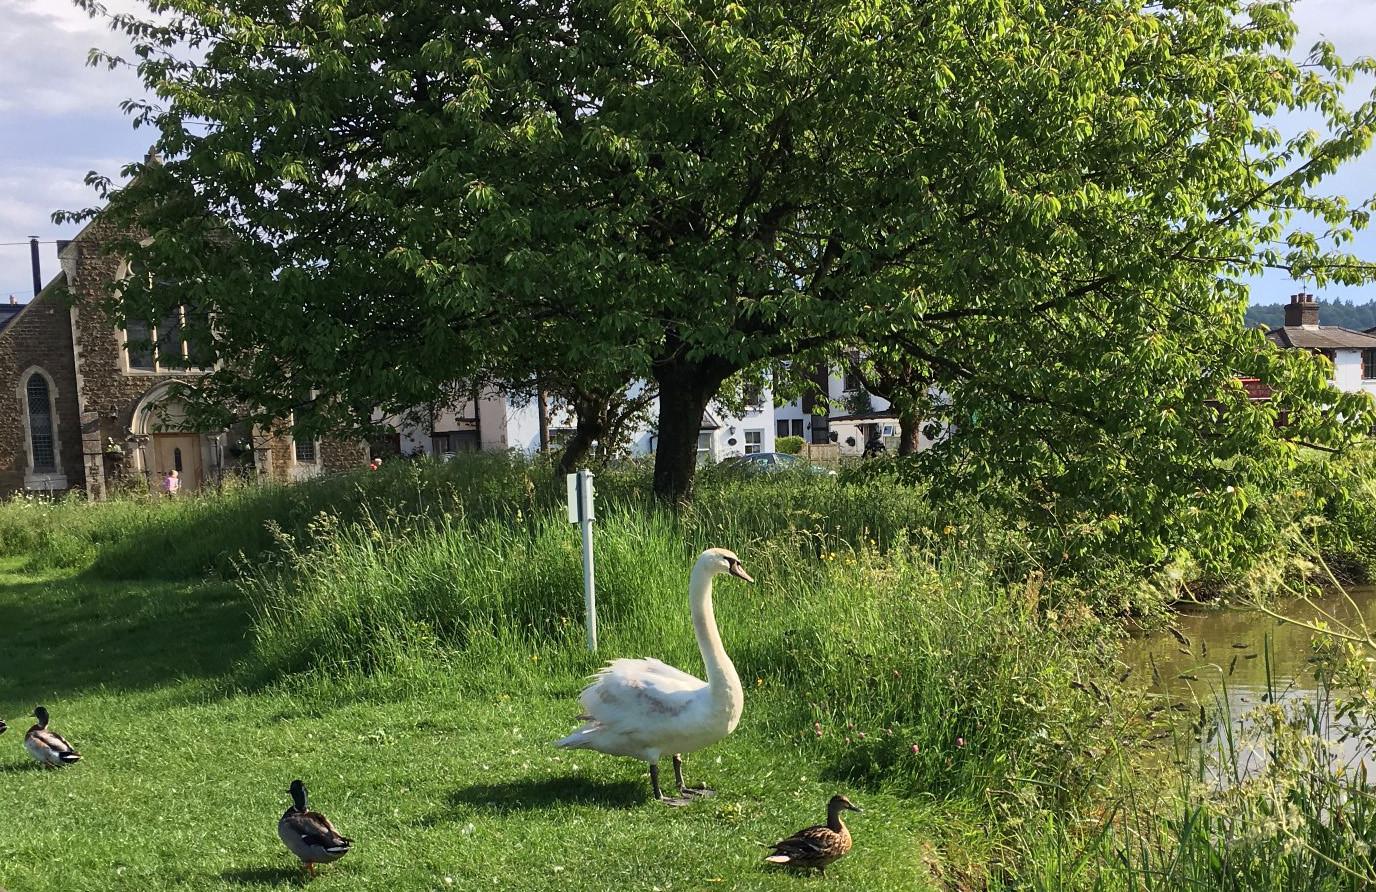 Shalford Pond